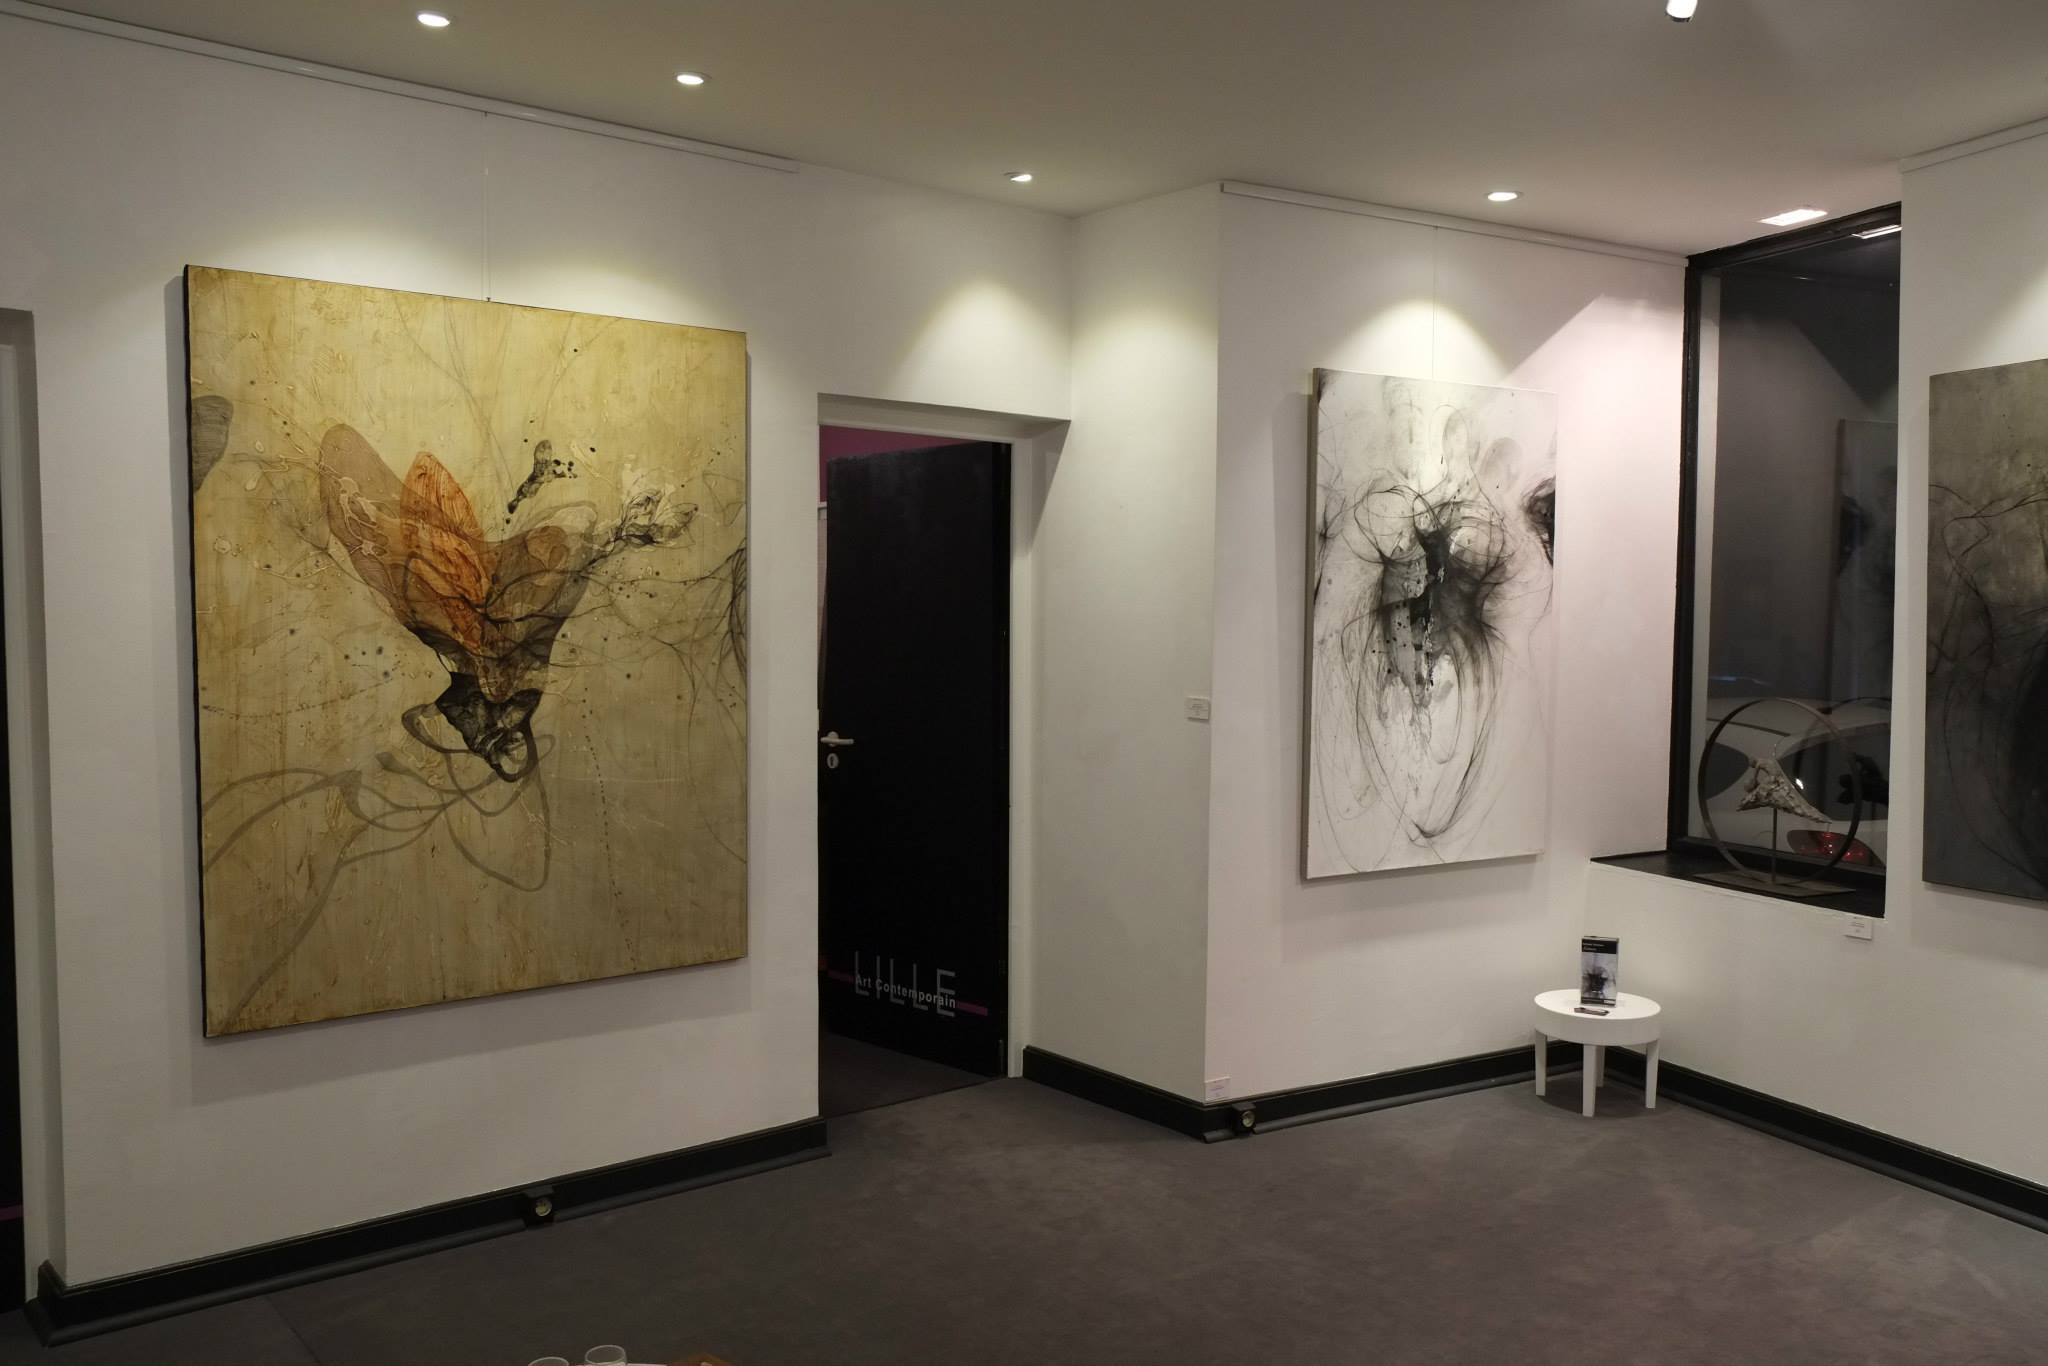 Nathalie DESHAIRS – Peintures expo Lille